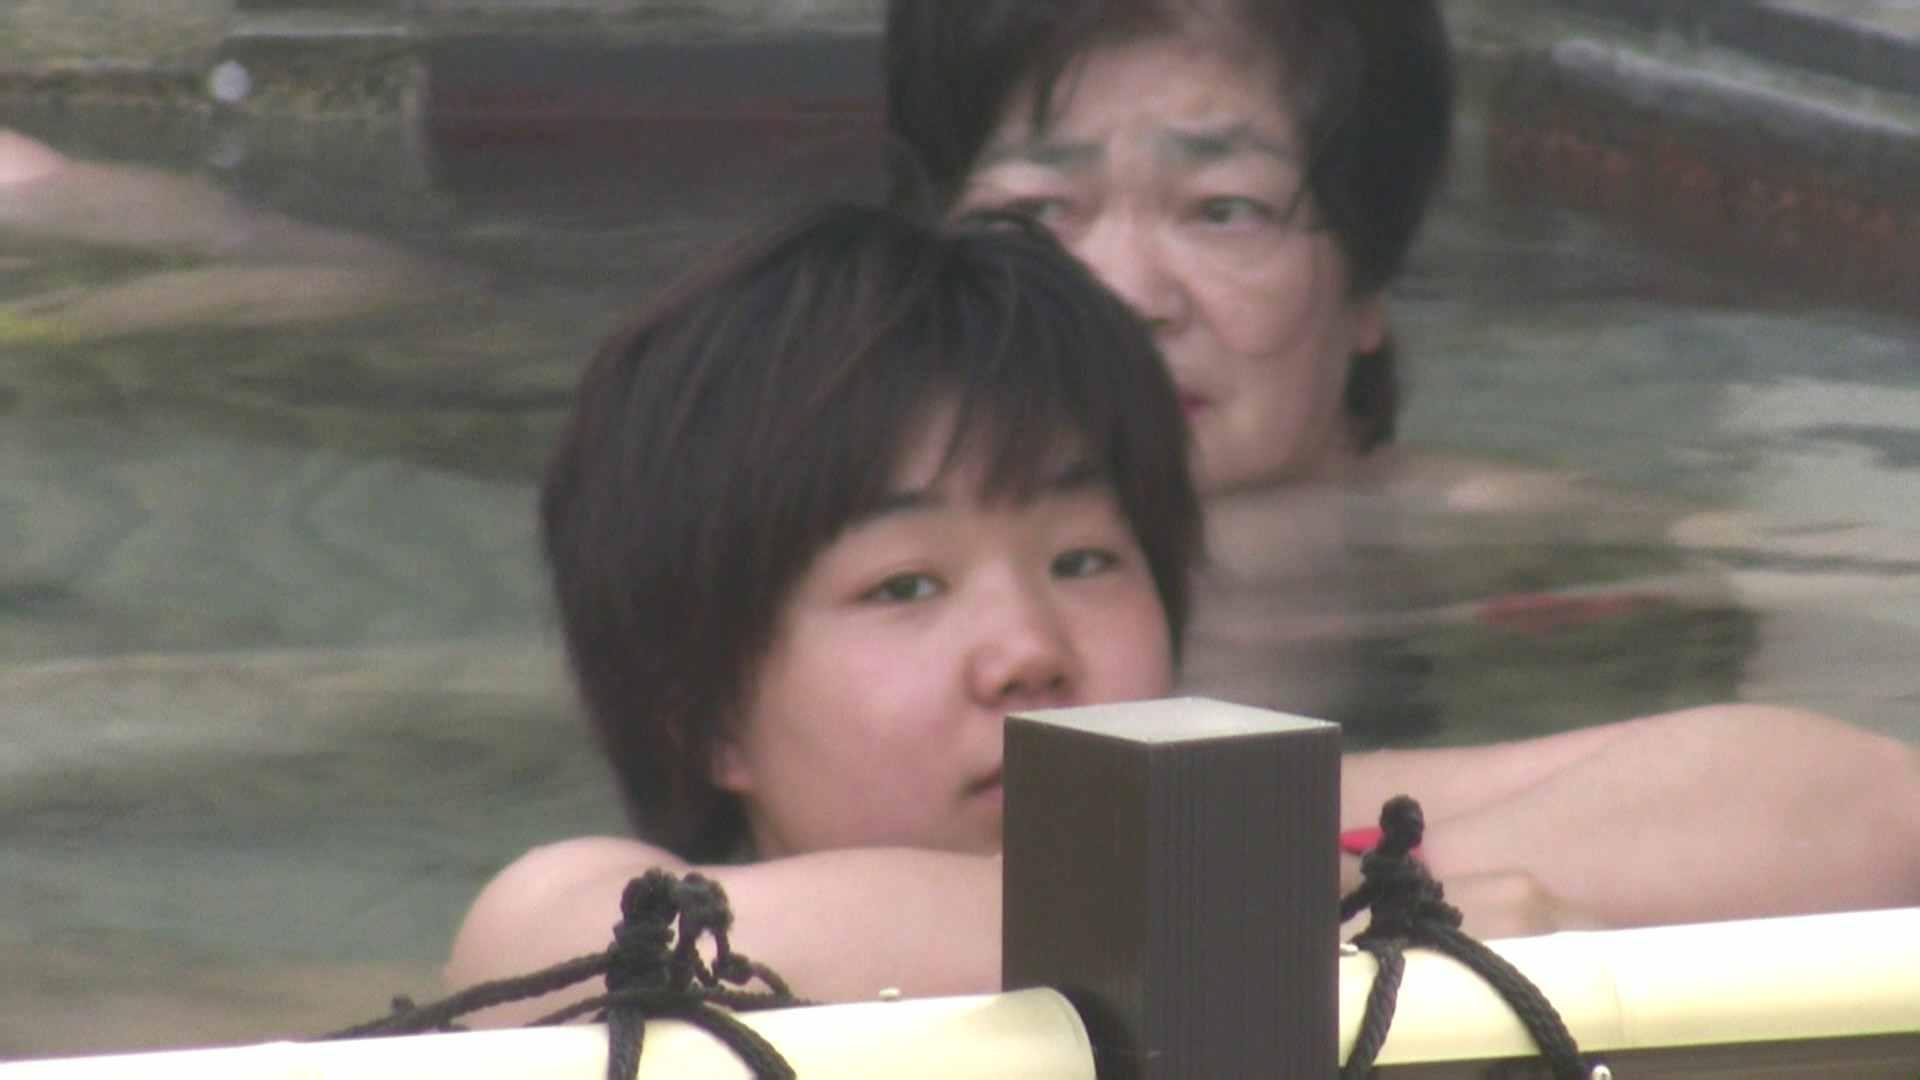 Aquaな露天風呂Vol.53【VIP限定】 女体盗撮 | OL女体  93連発 25